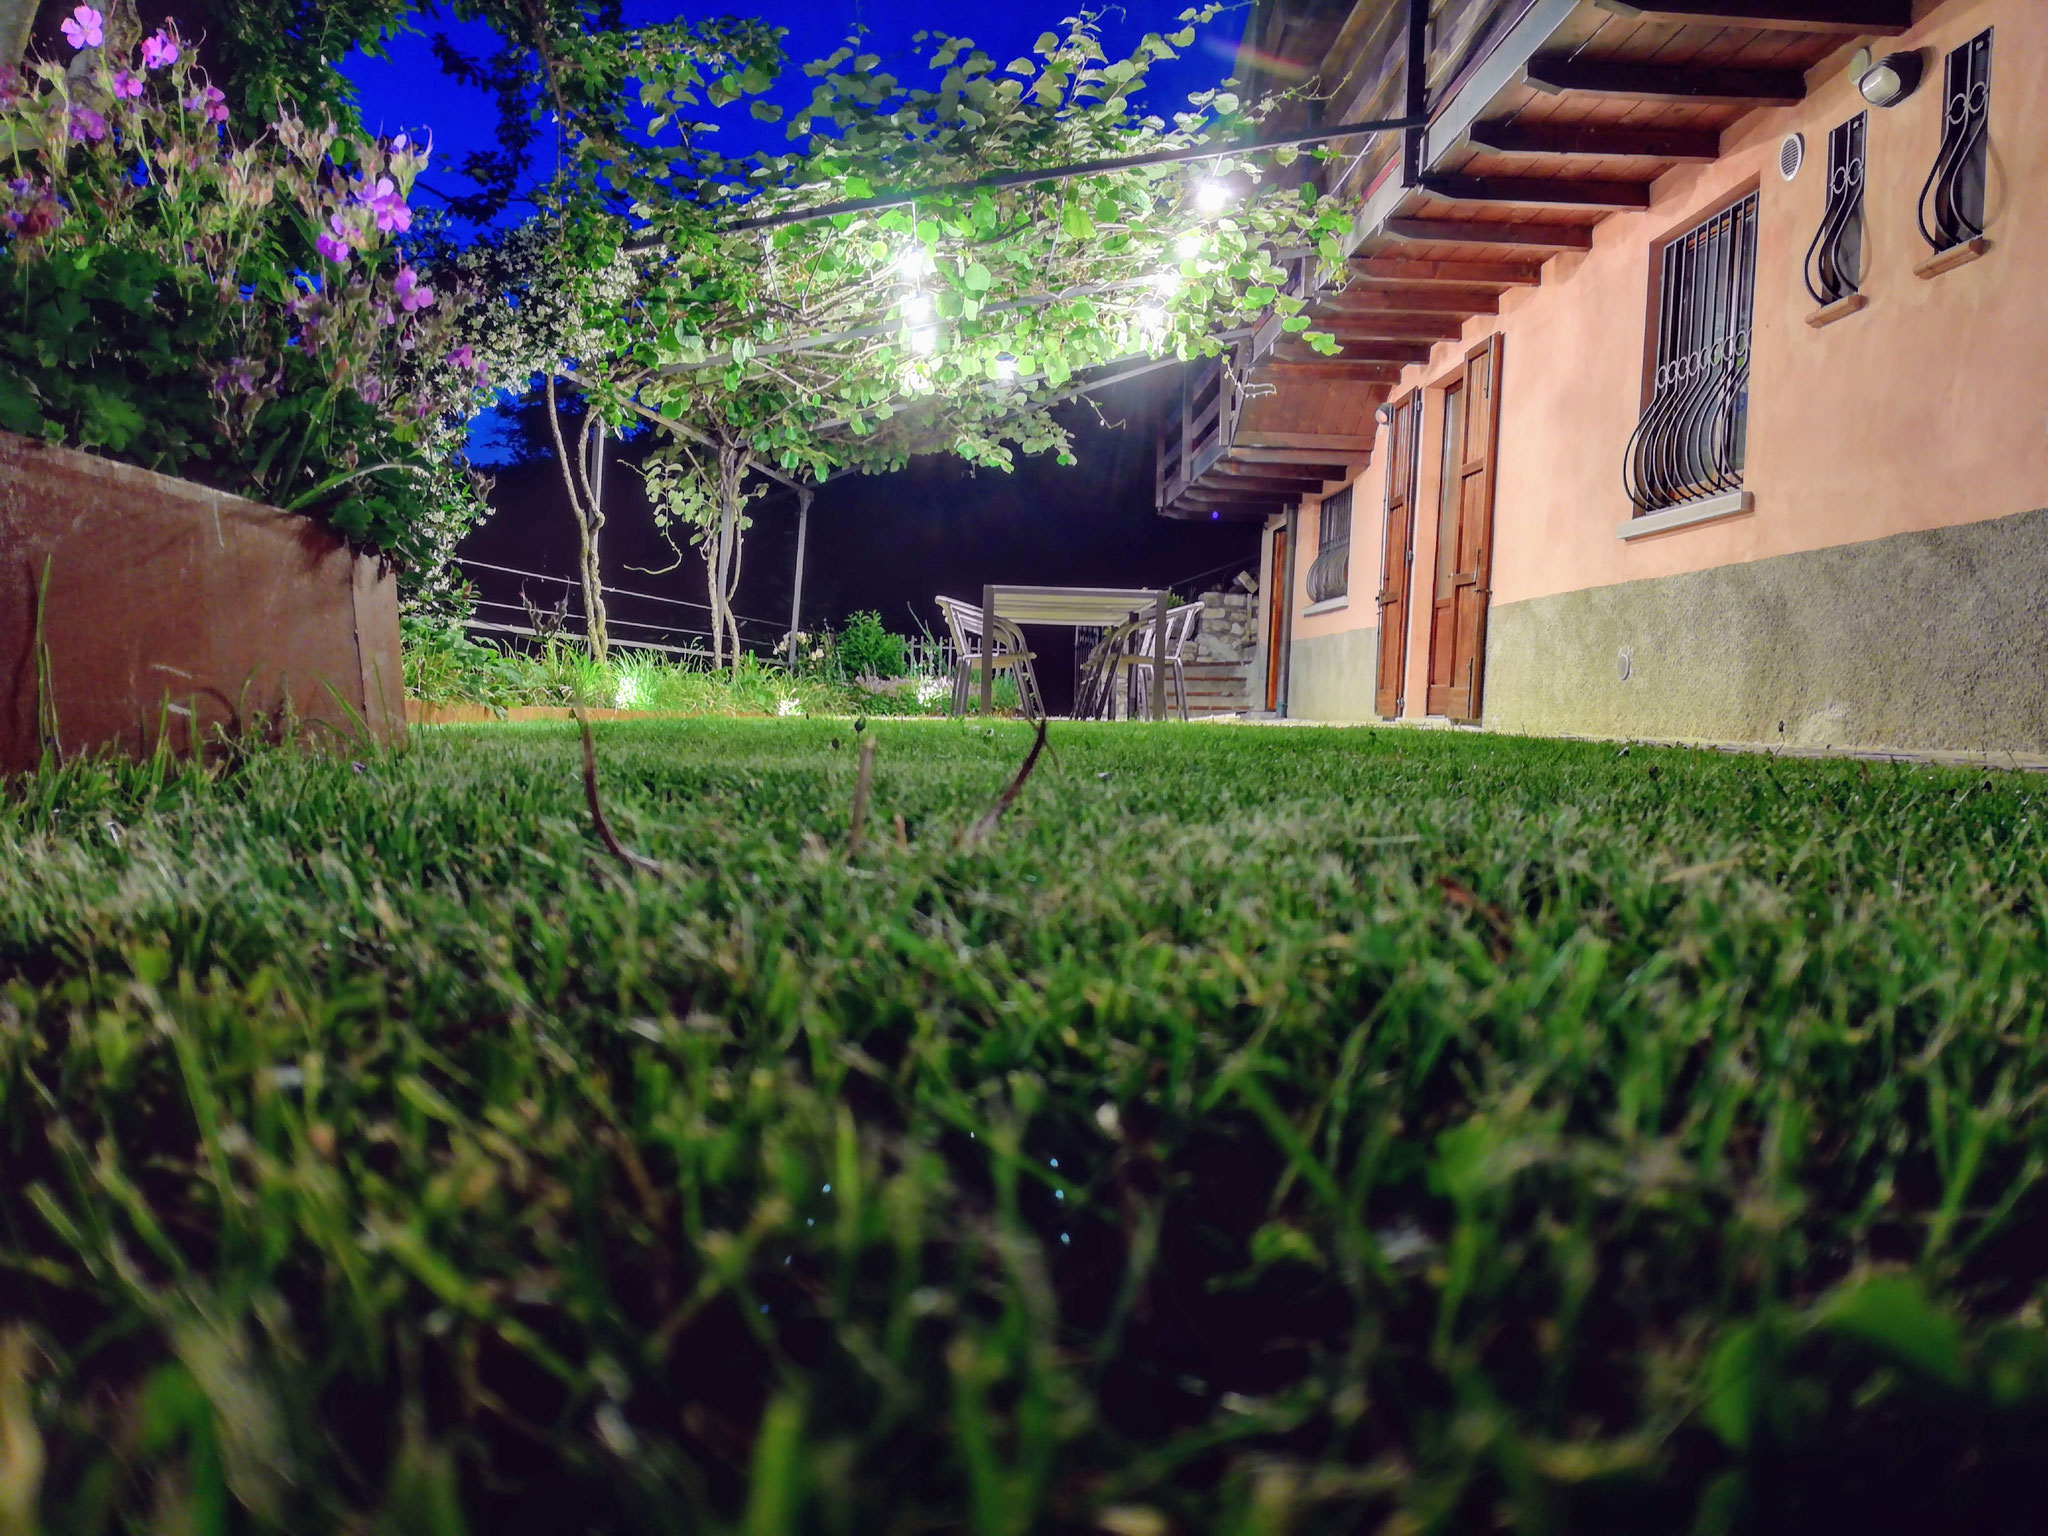 Casa San Giorgio Holiday House - Bedroom Holiday House AIR BNB Bed Breakfast Bergamo